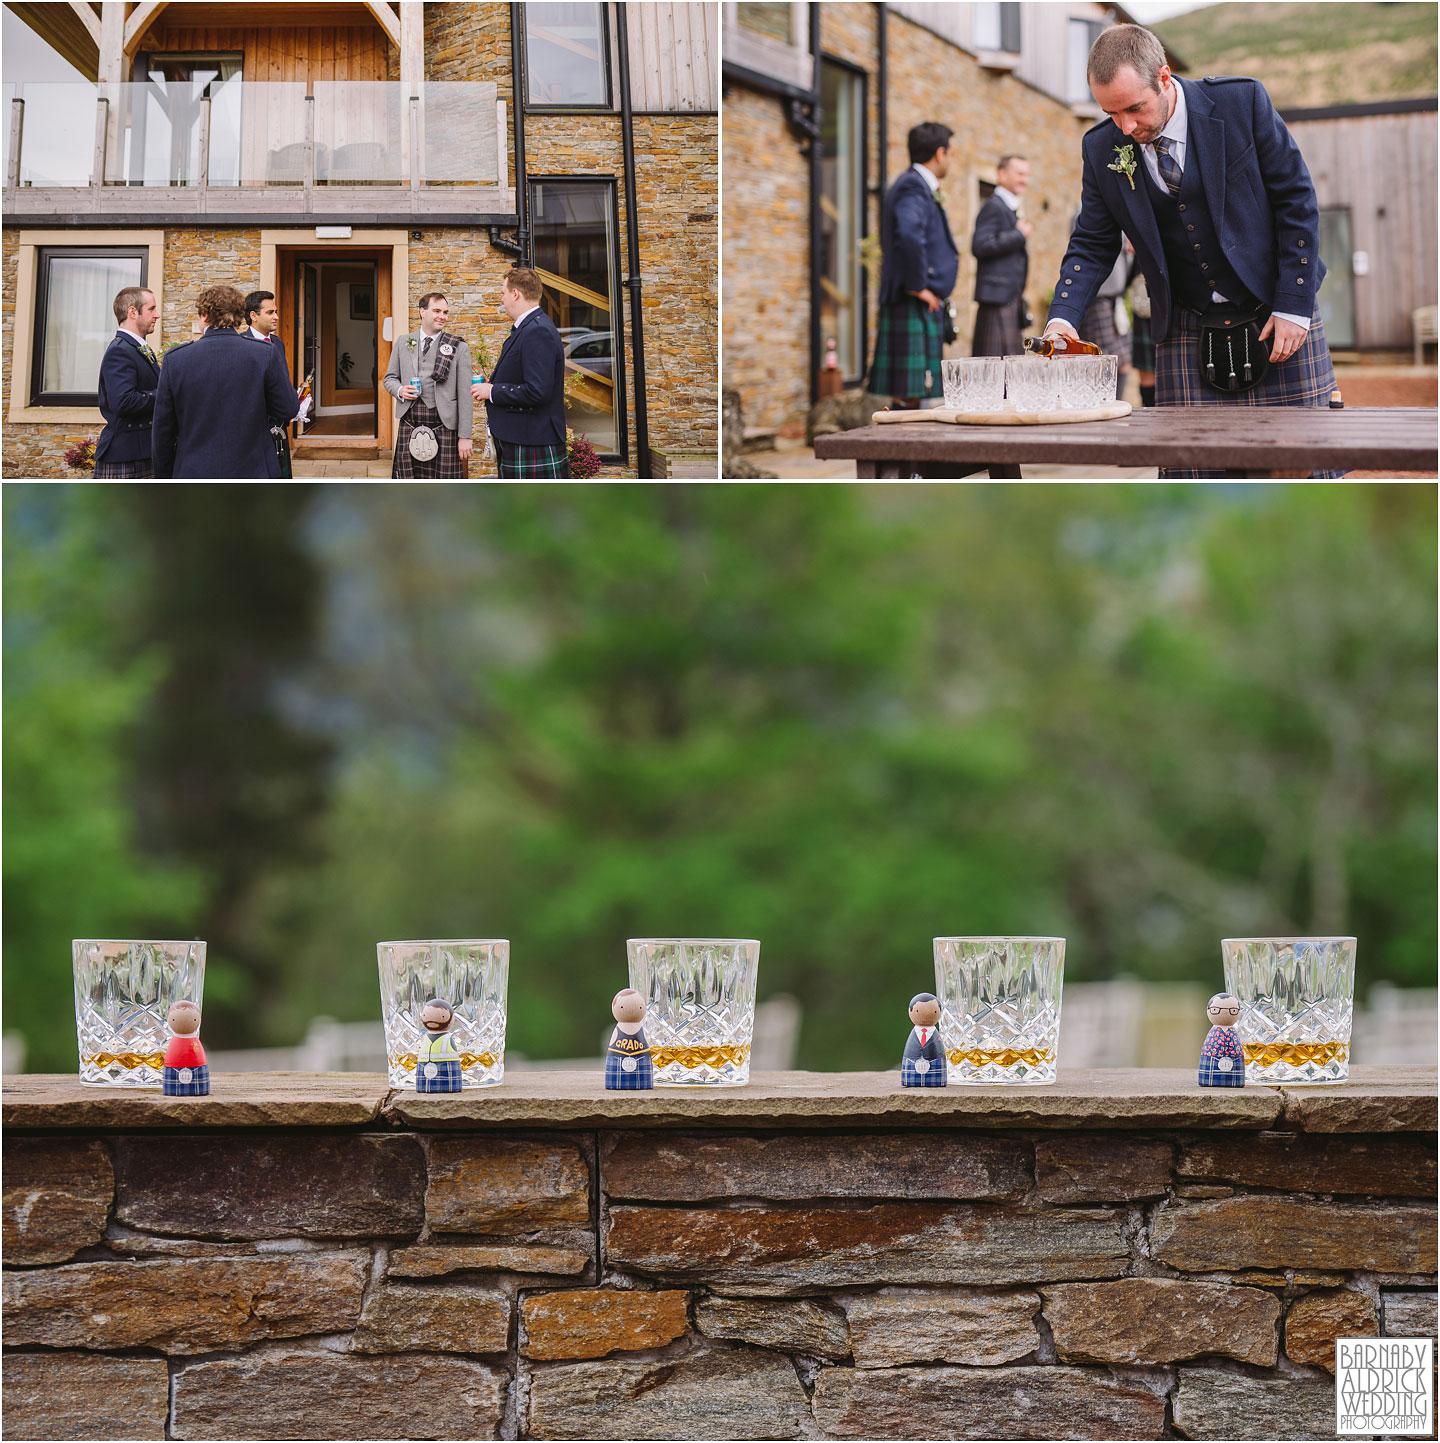 Scotch Wedding Whisky, Groomsmen Scotch Whisky photo, Carrick Castle Estate Lodge Wedding, Loch Goil Wedding photos, Argyll Forest Park Wedding Scotland, Scottish Wedding, Scottish Lockdown Wedding, Scottish Wedding